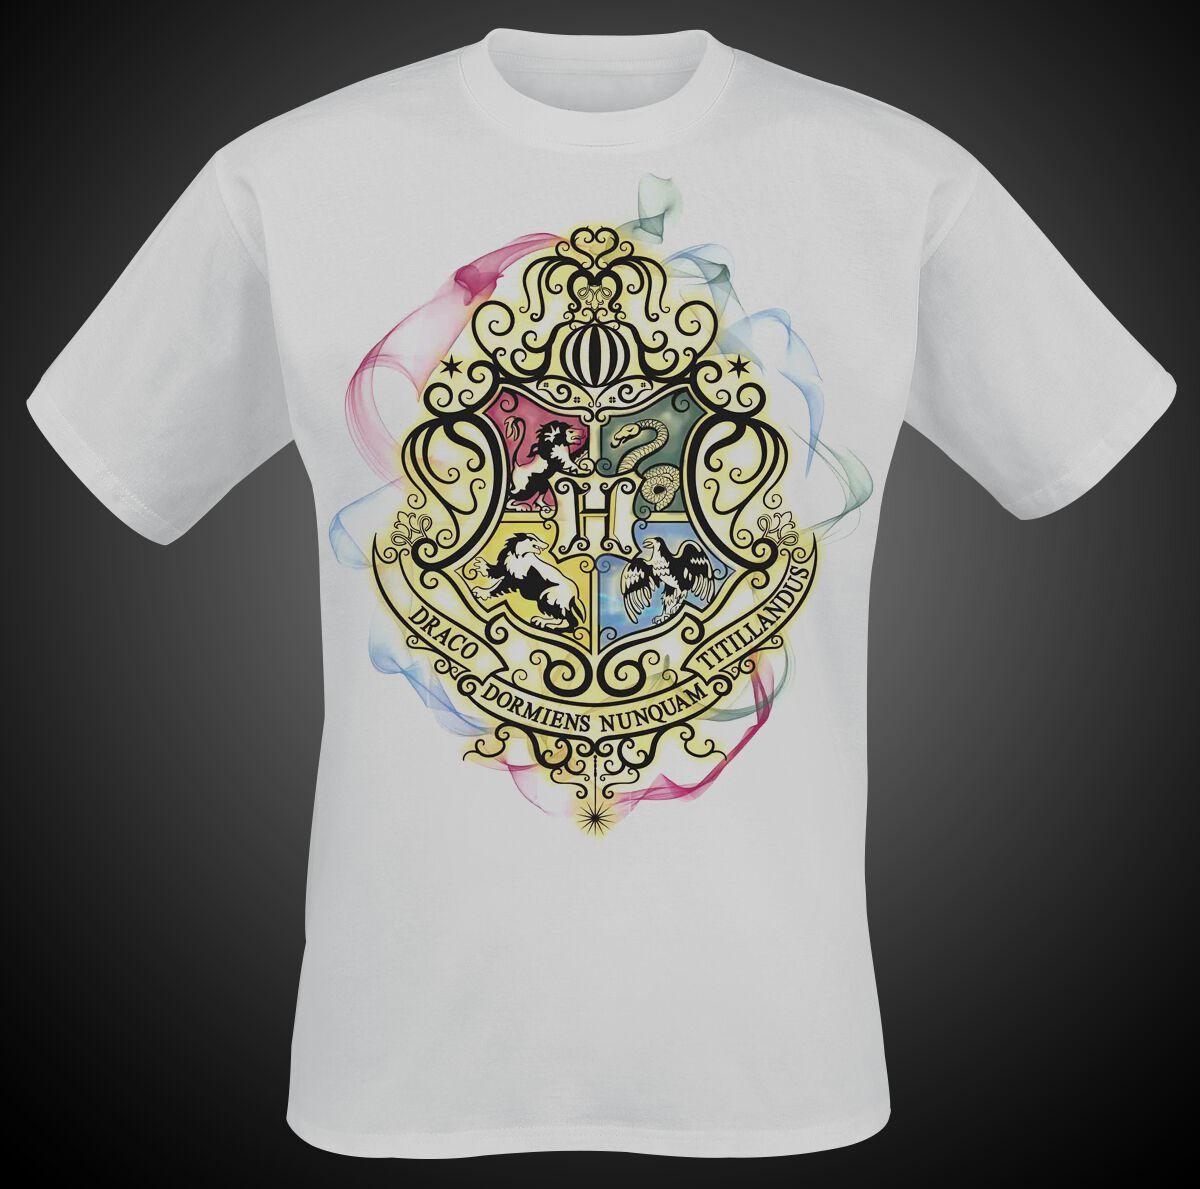 Hogwarts uv print t shirt buy online now for Uv t shirt printing